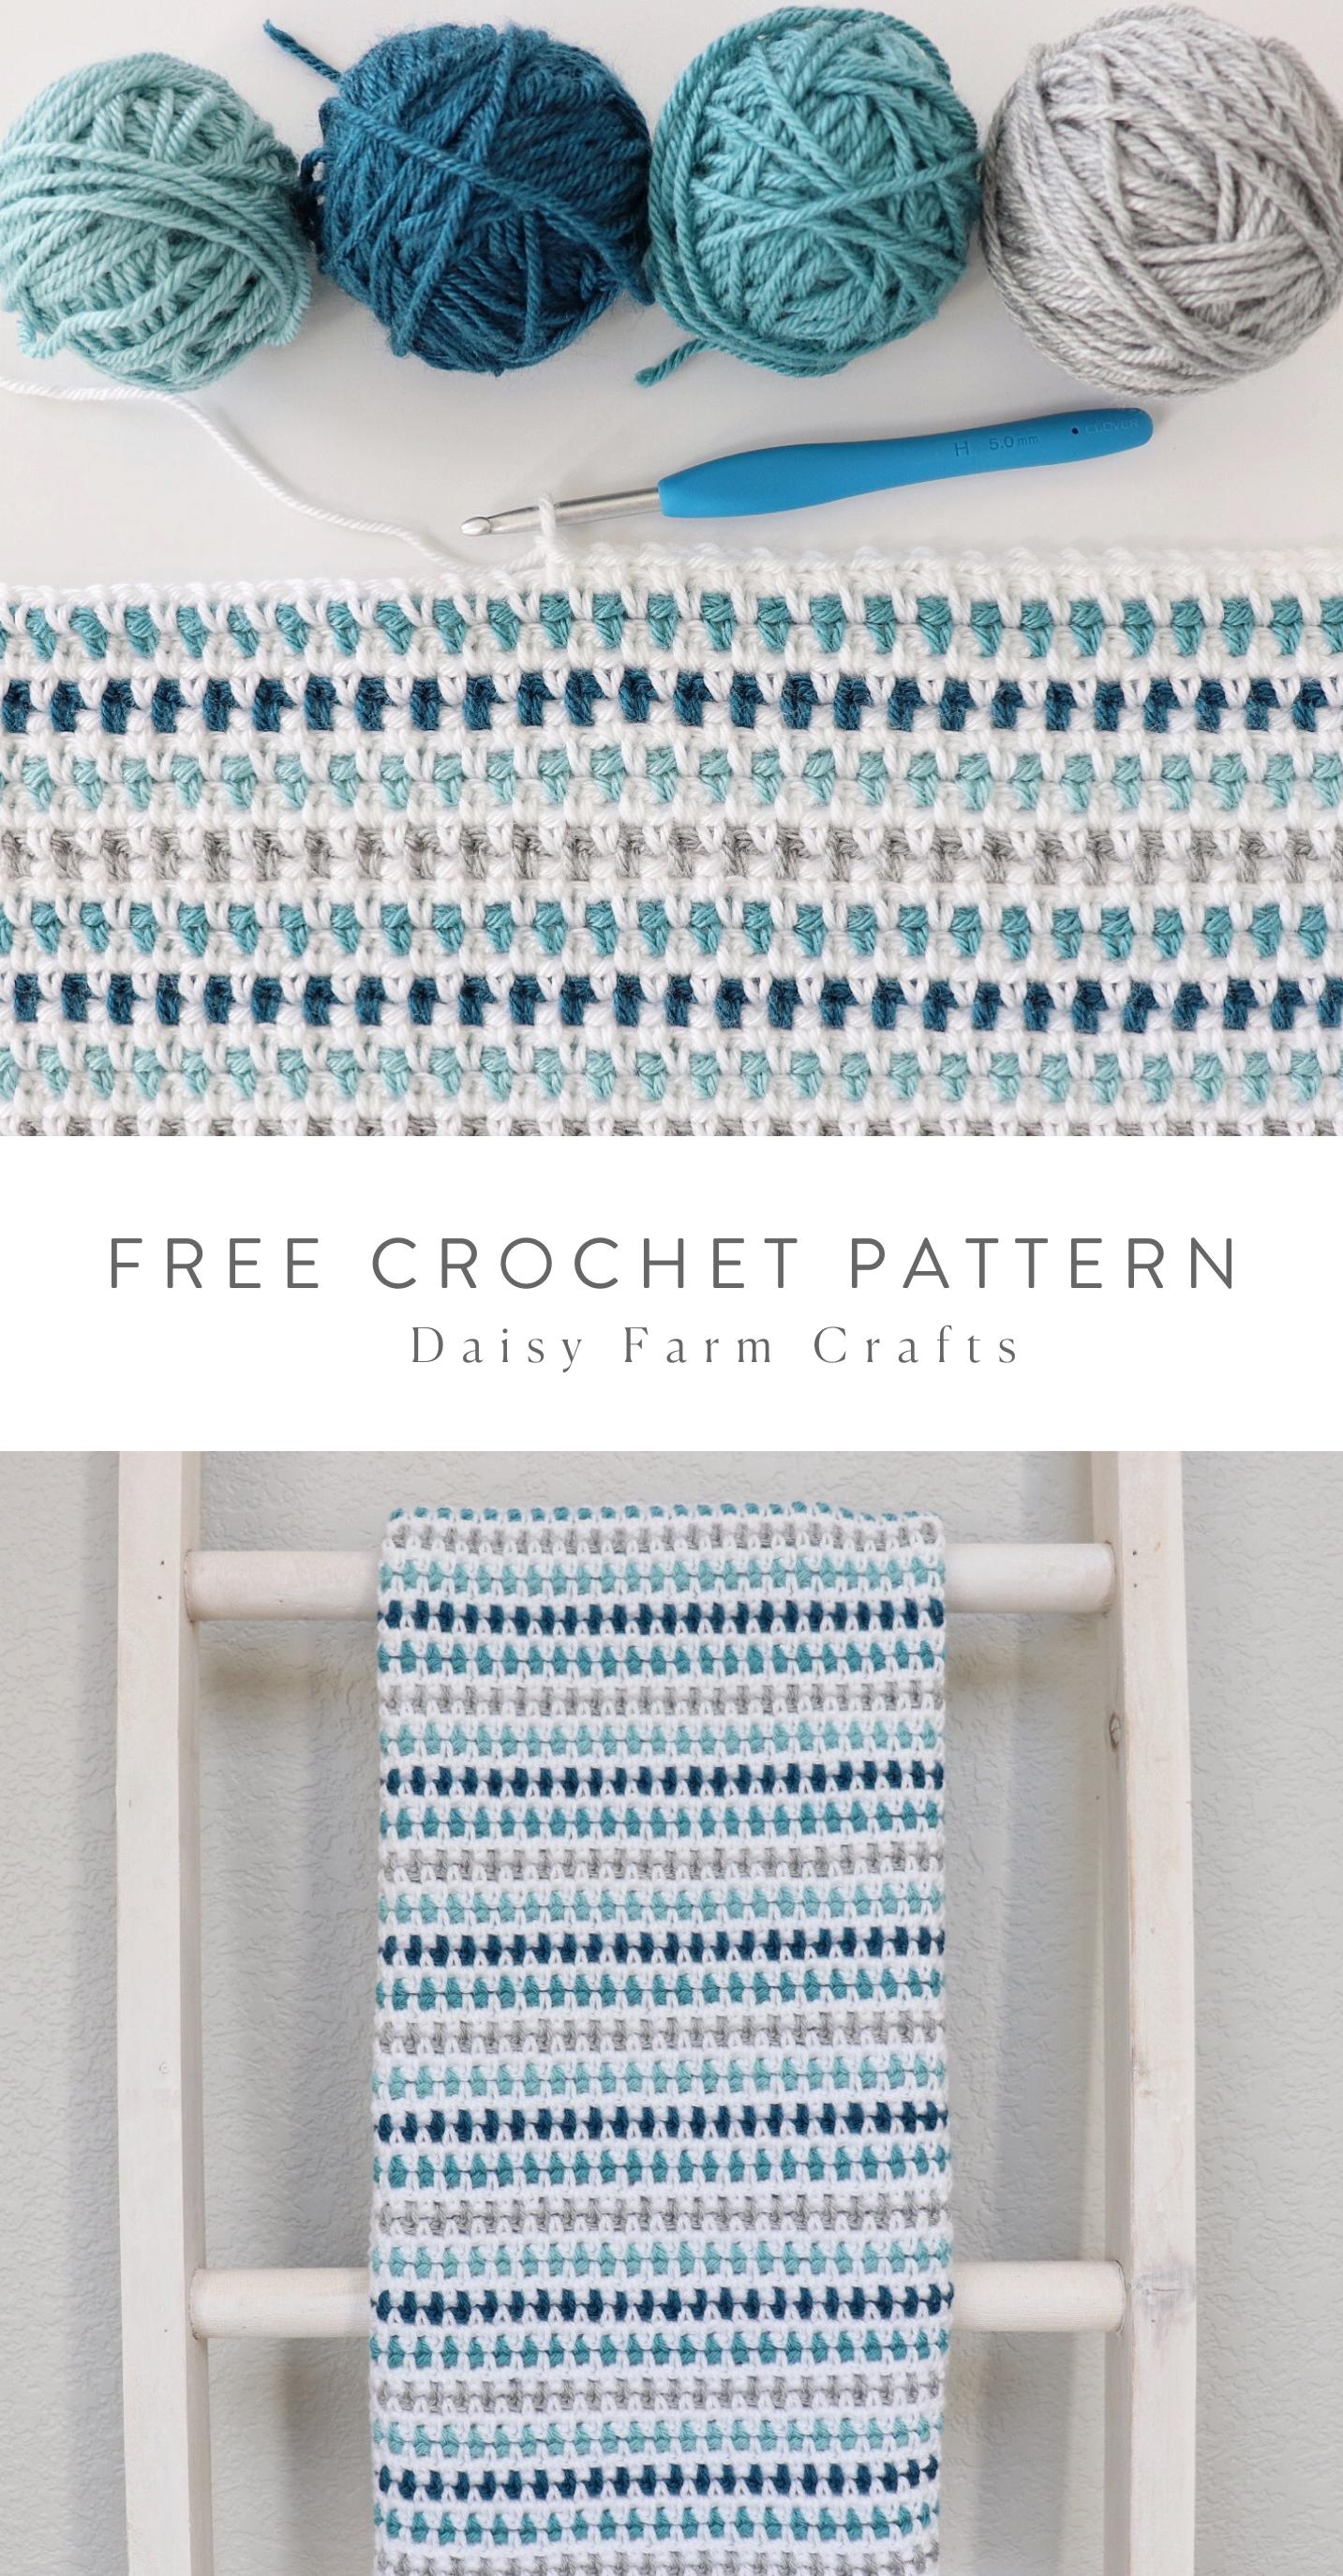 Free Pattern - Crochet Speckled Moss Stitch Blanket